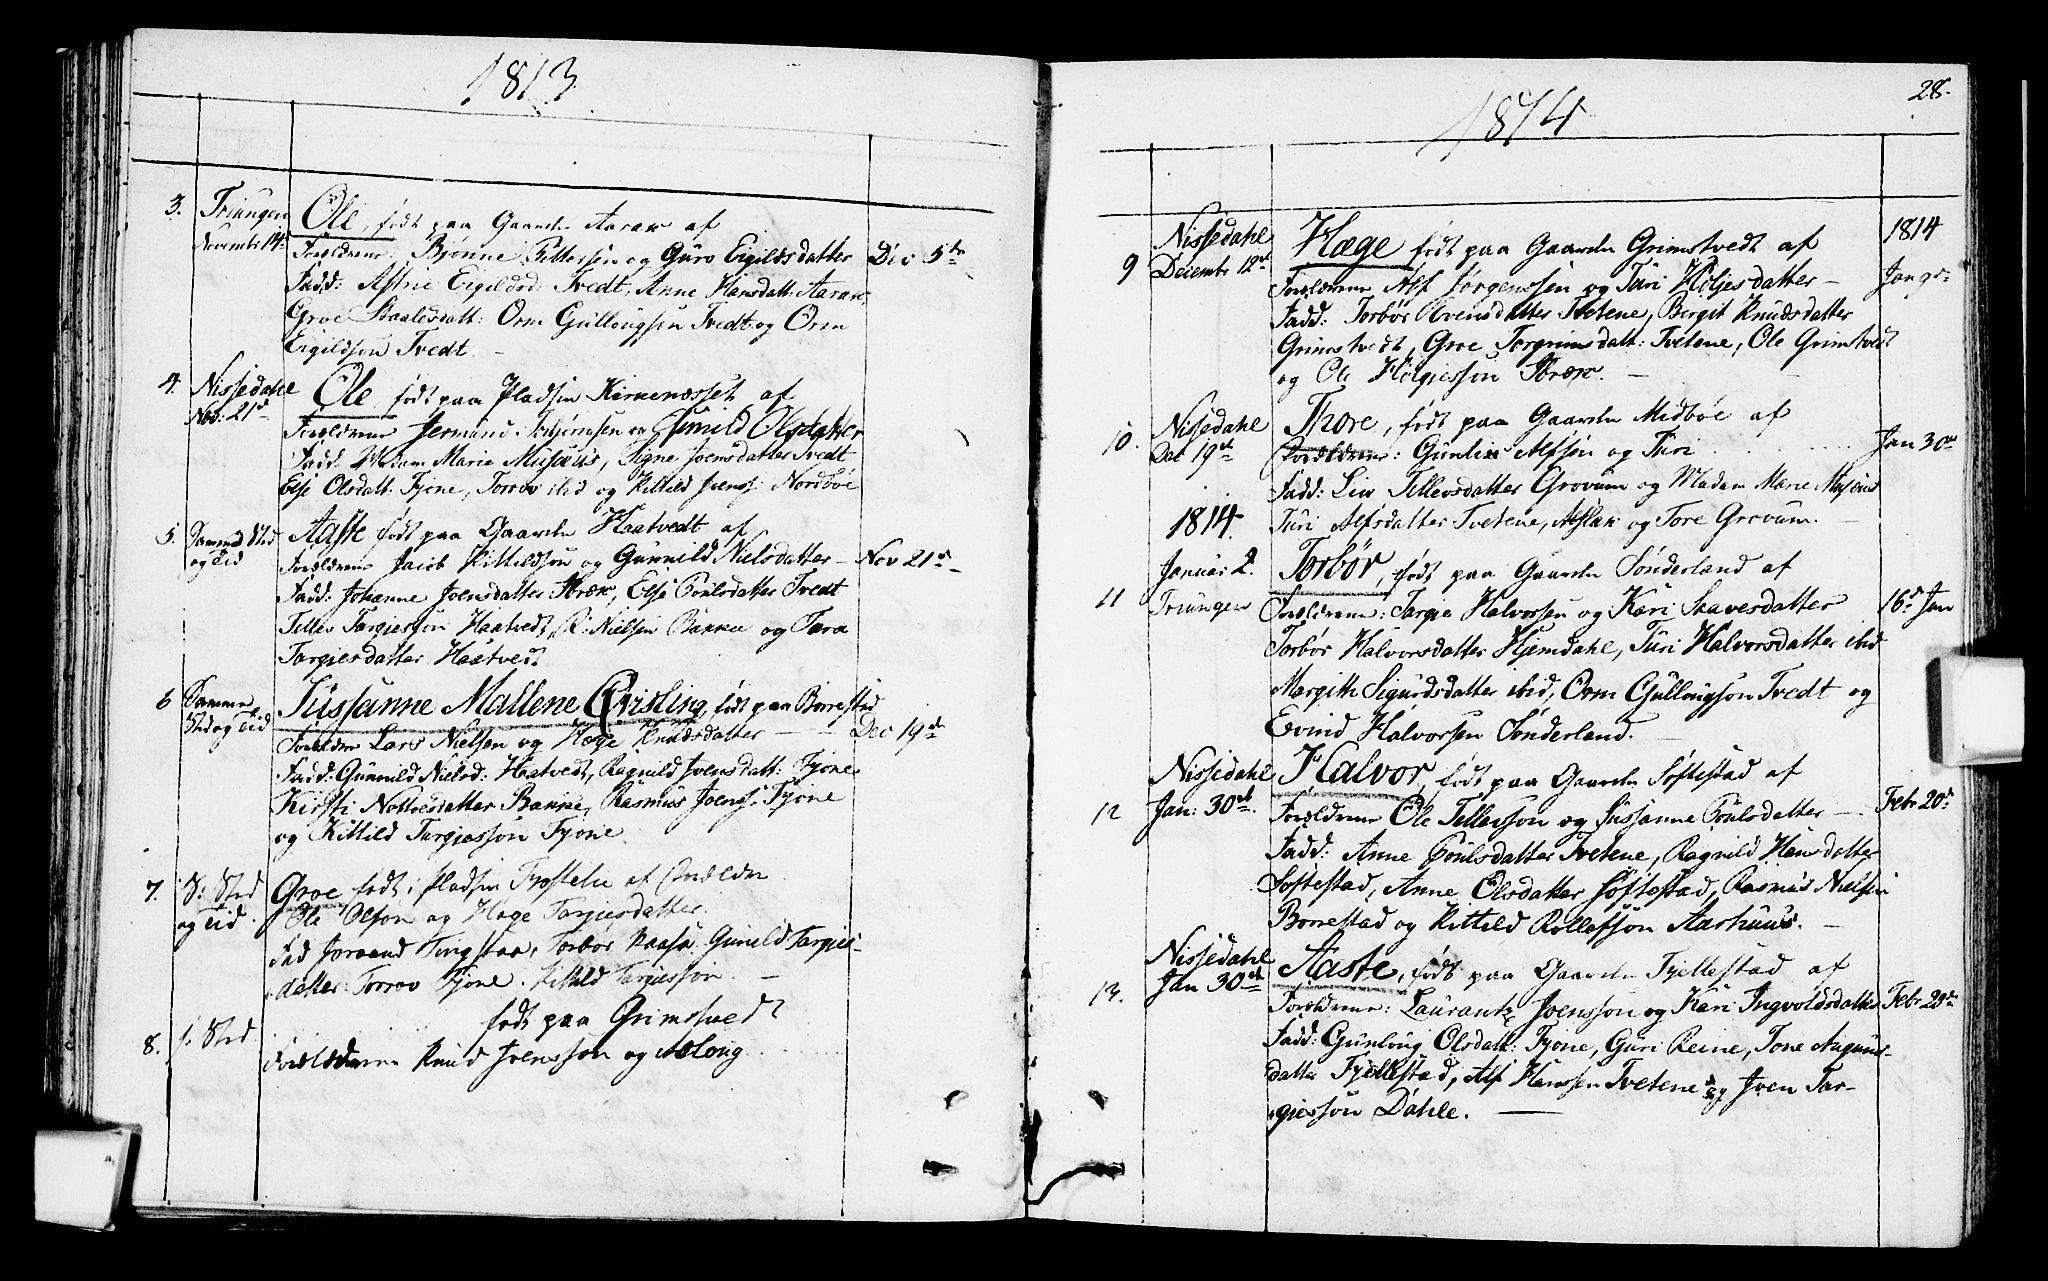 SAKO, Nissedal kirkebøker, F/Fa/L0001: Ministerialbok nr. I 1, 1811-1814, s. 28